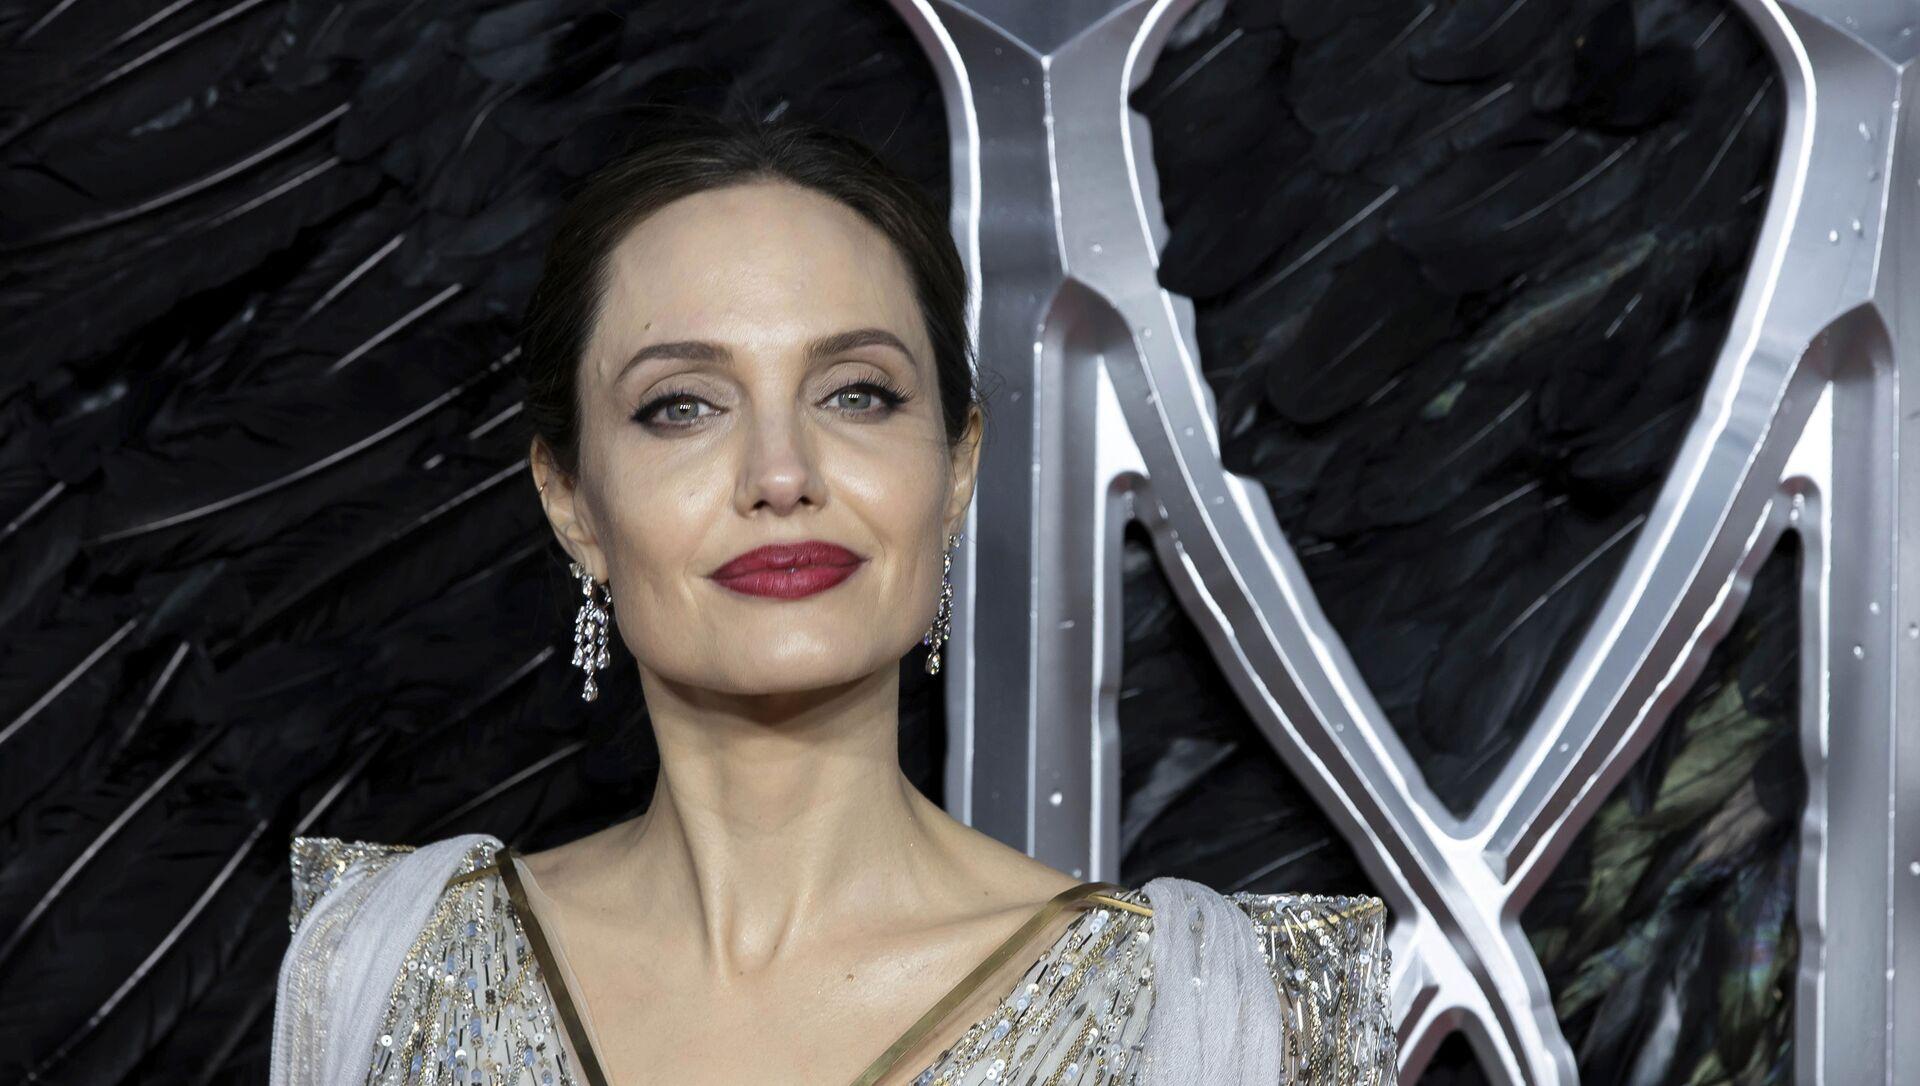 Анджелина Джоли - Sputnik Беларусь, 1920, 11.03.2021